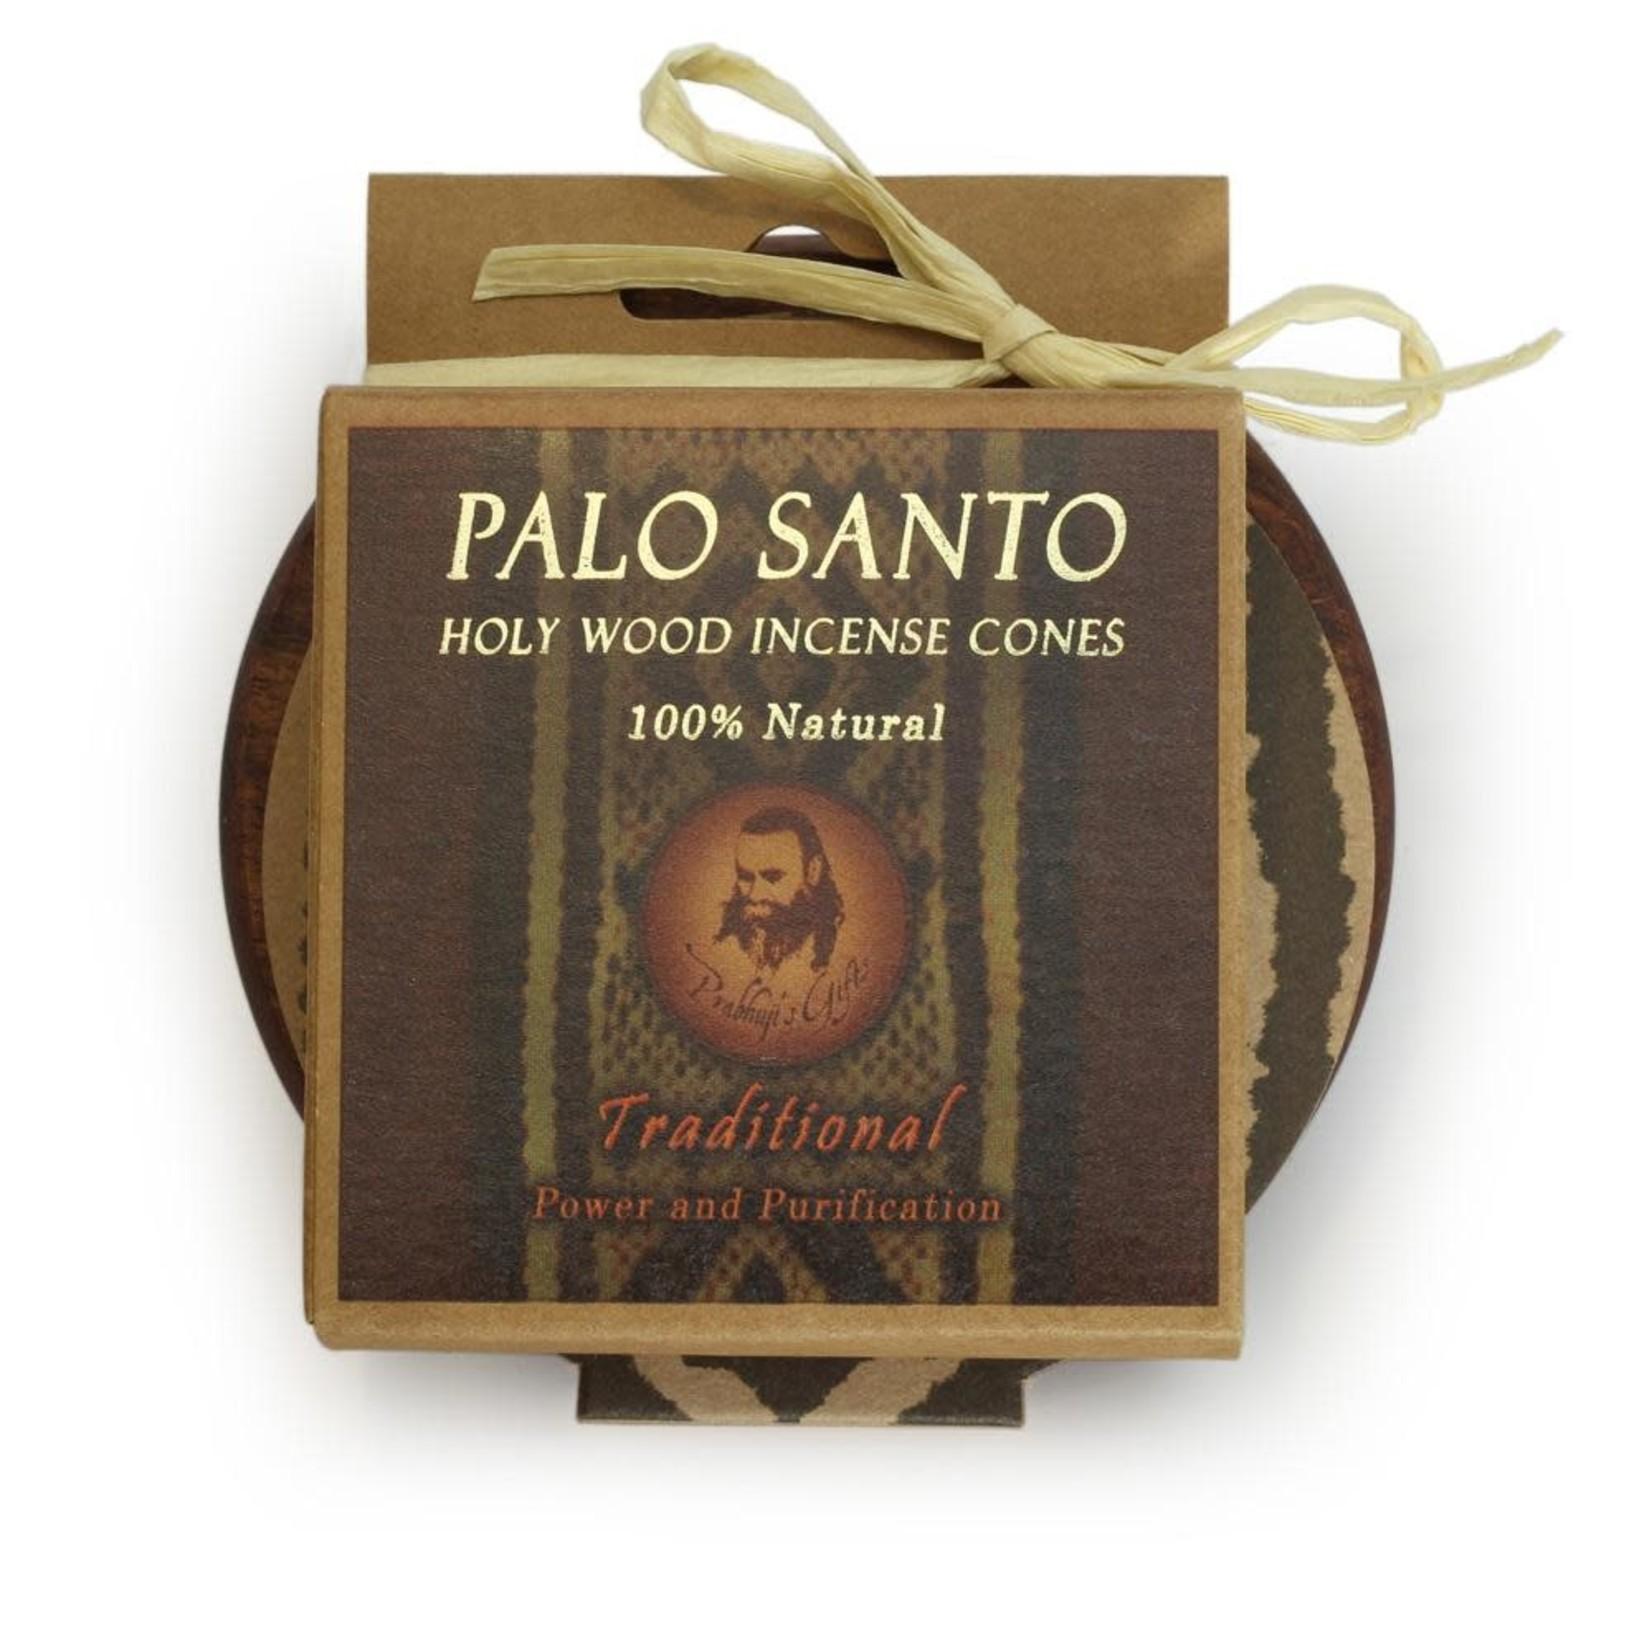 Prabhujis Gifts Palo Santo Traditional Cones with Burner